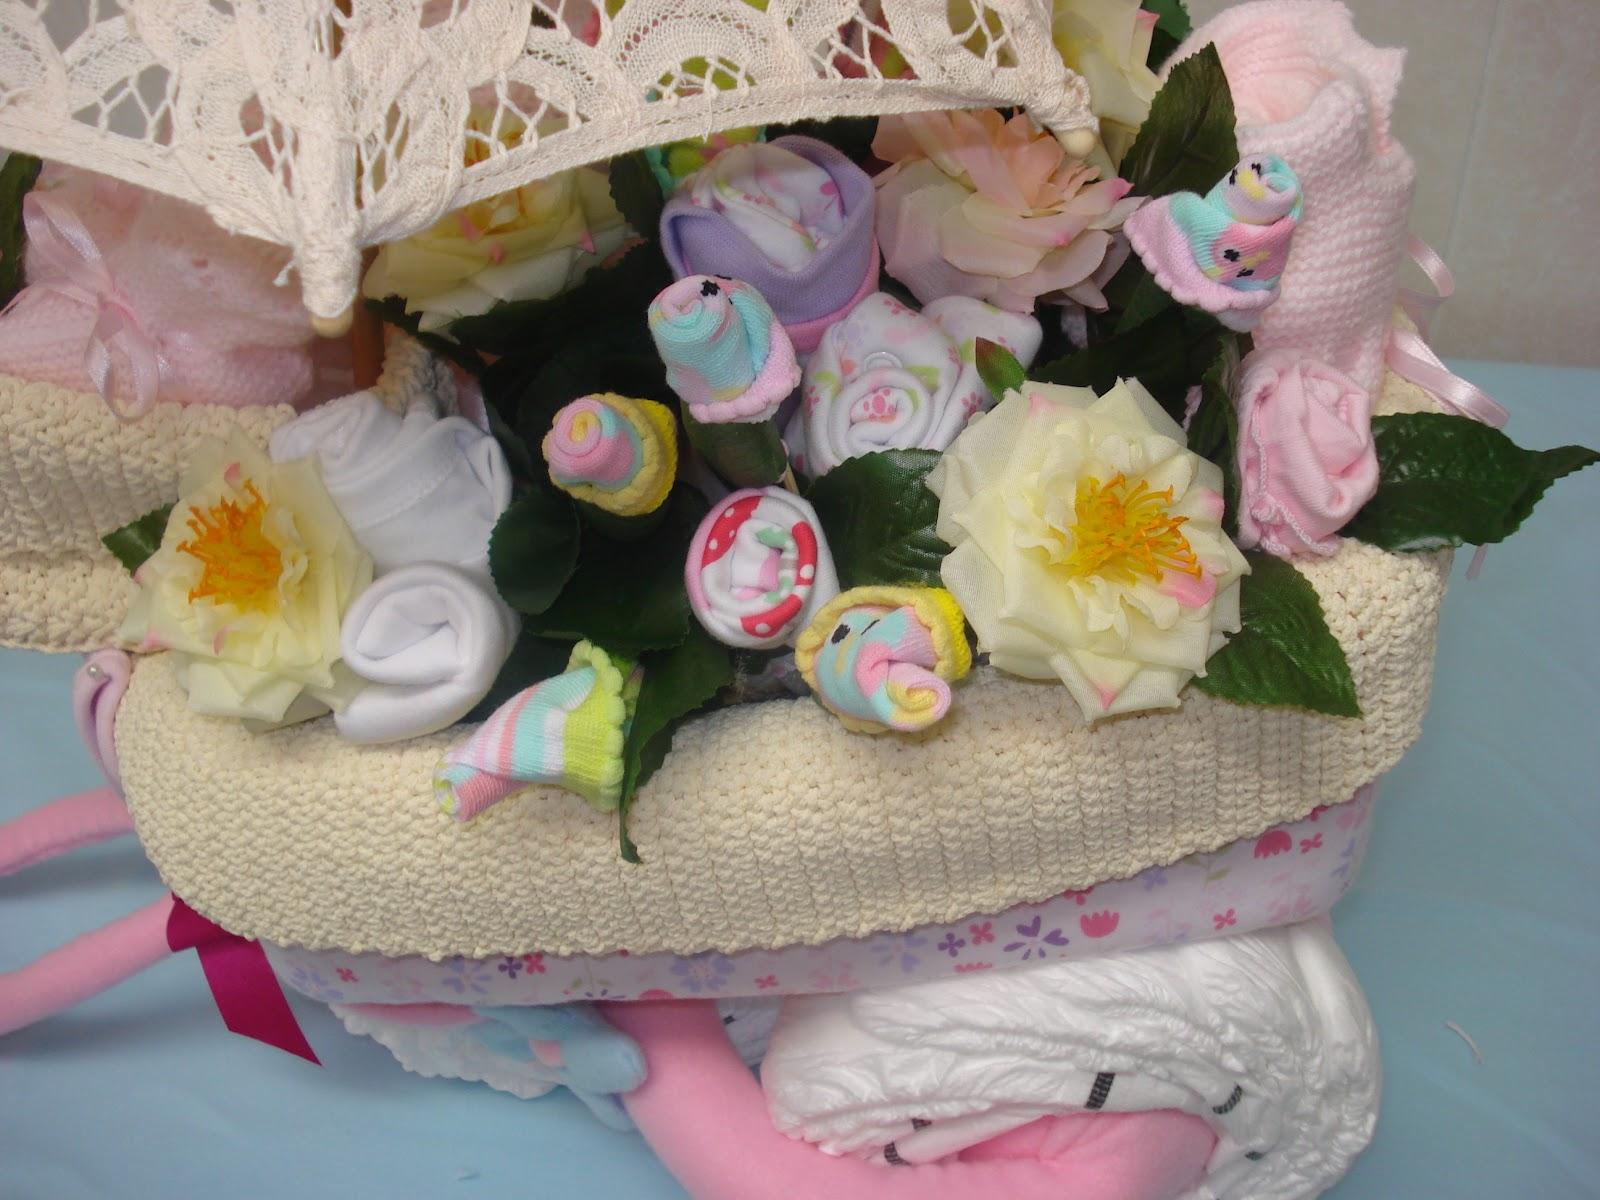 58345223a8ca CosasdeMarina | Regalos con pañales, detalles para bebes: Carrito de ...